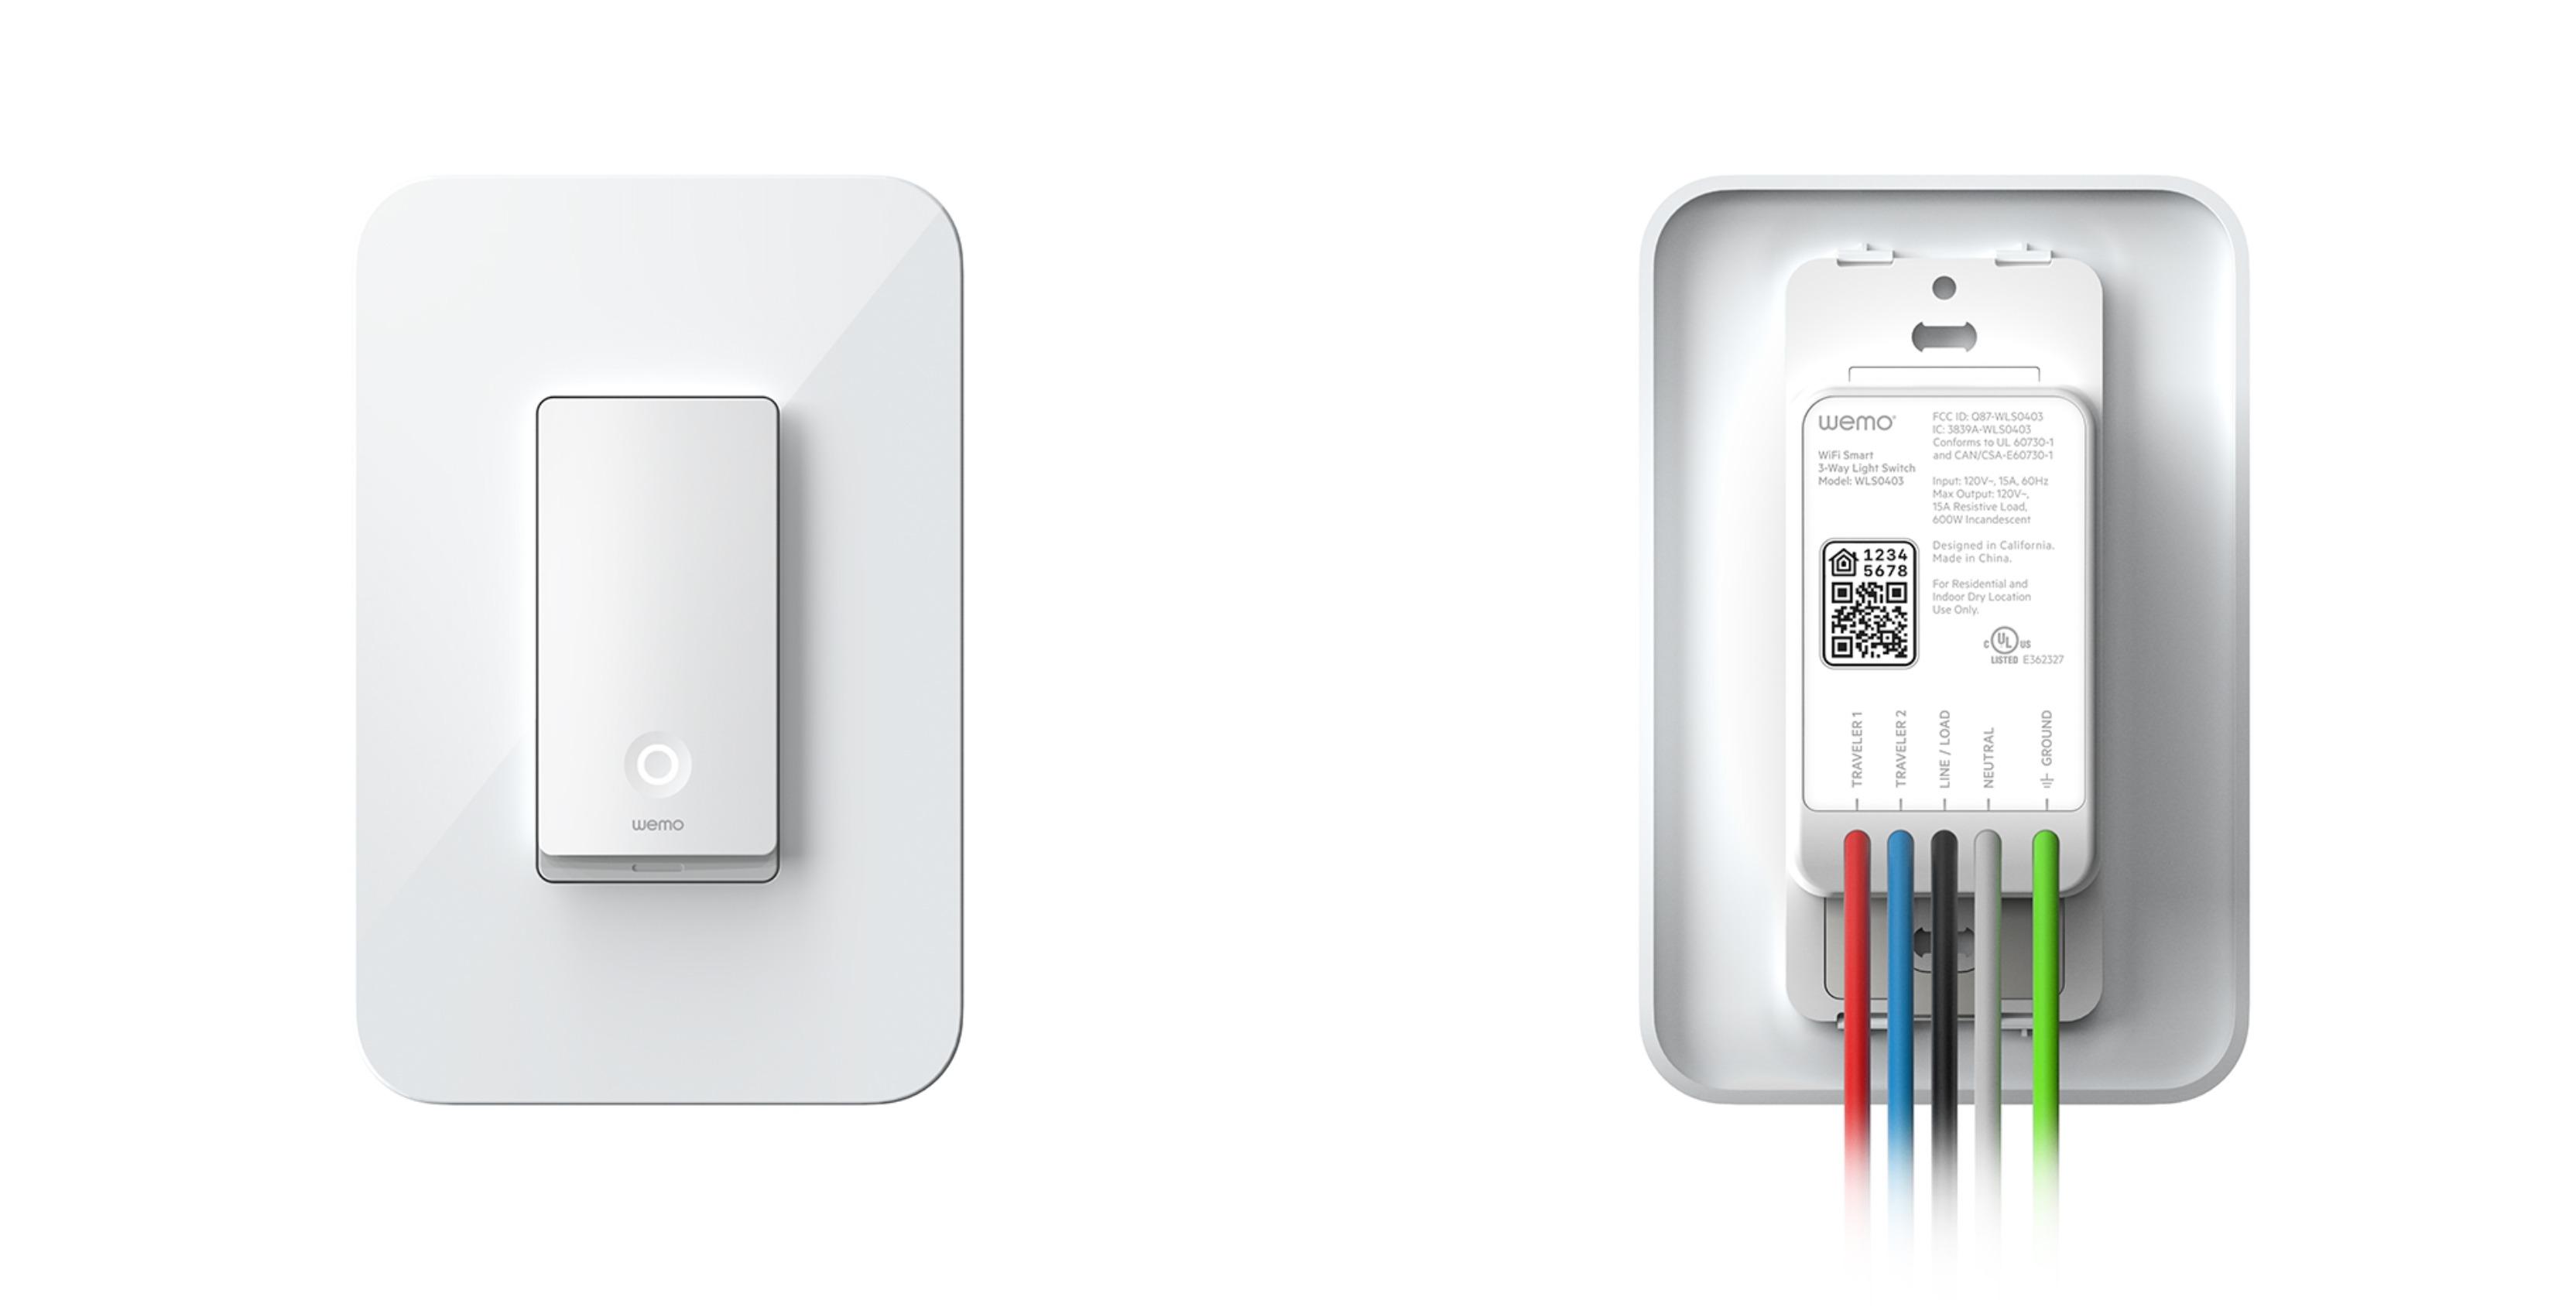 [TVPR_3874]  Belkin reveals 3-way Wemo smart light switch at CES | Wemo Wiring Diagram |  | MobileSyrup